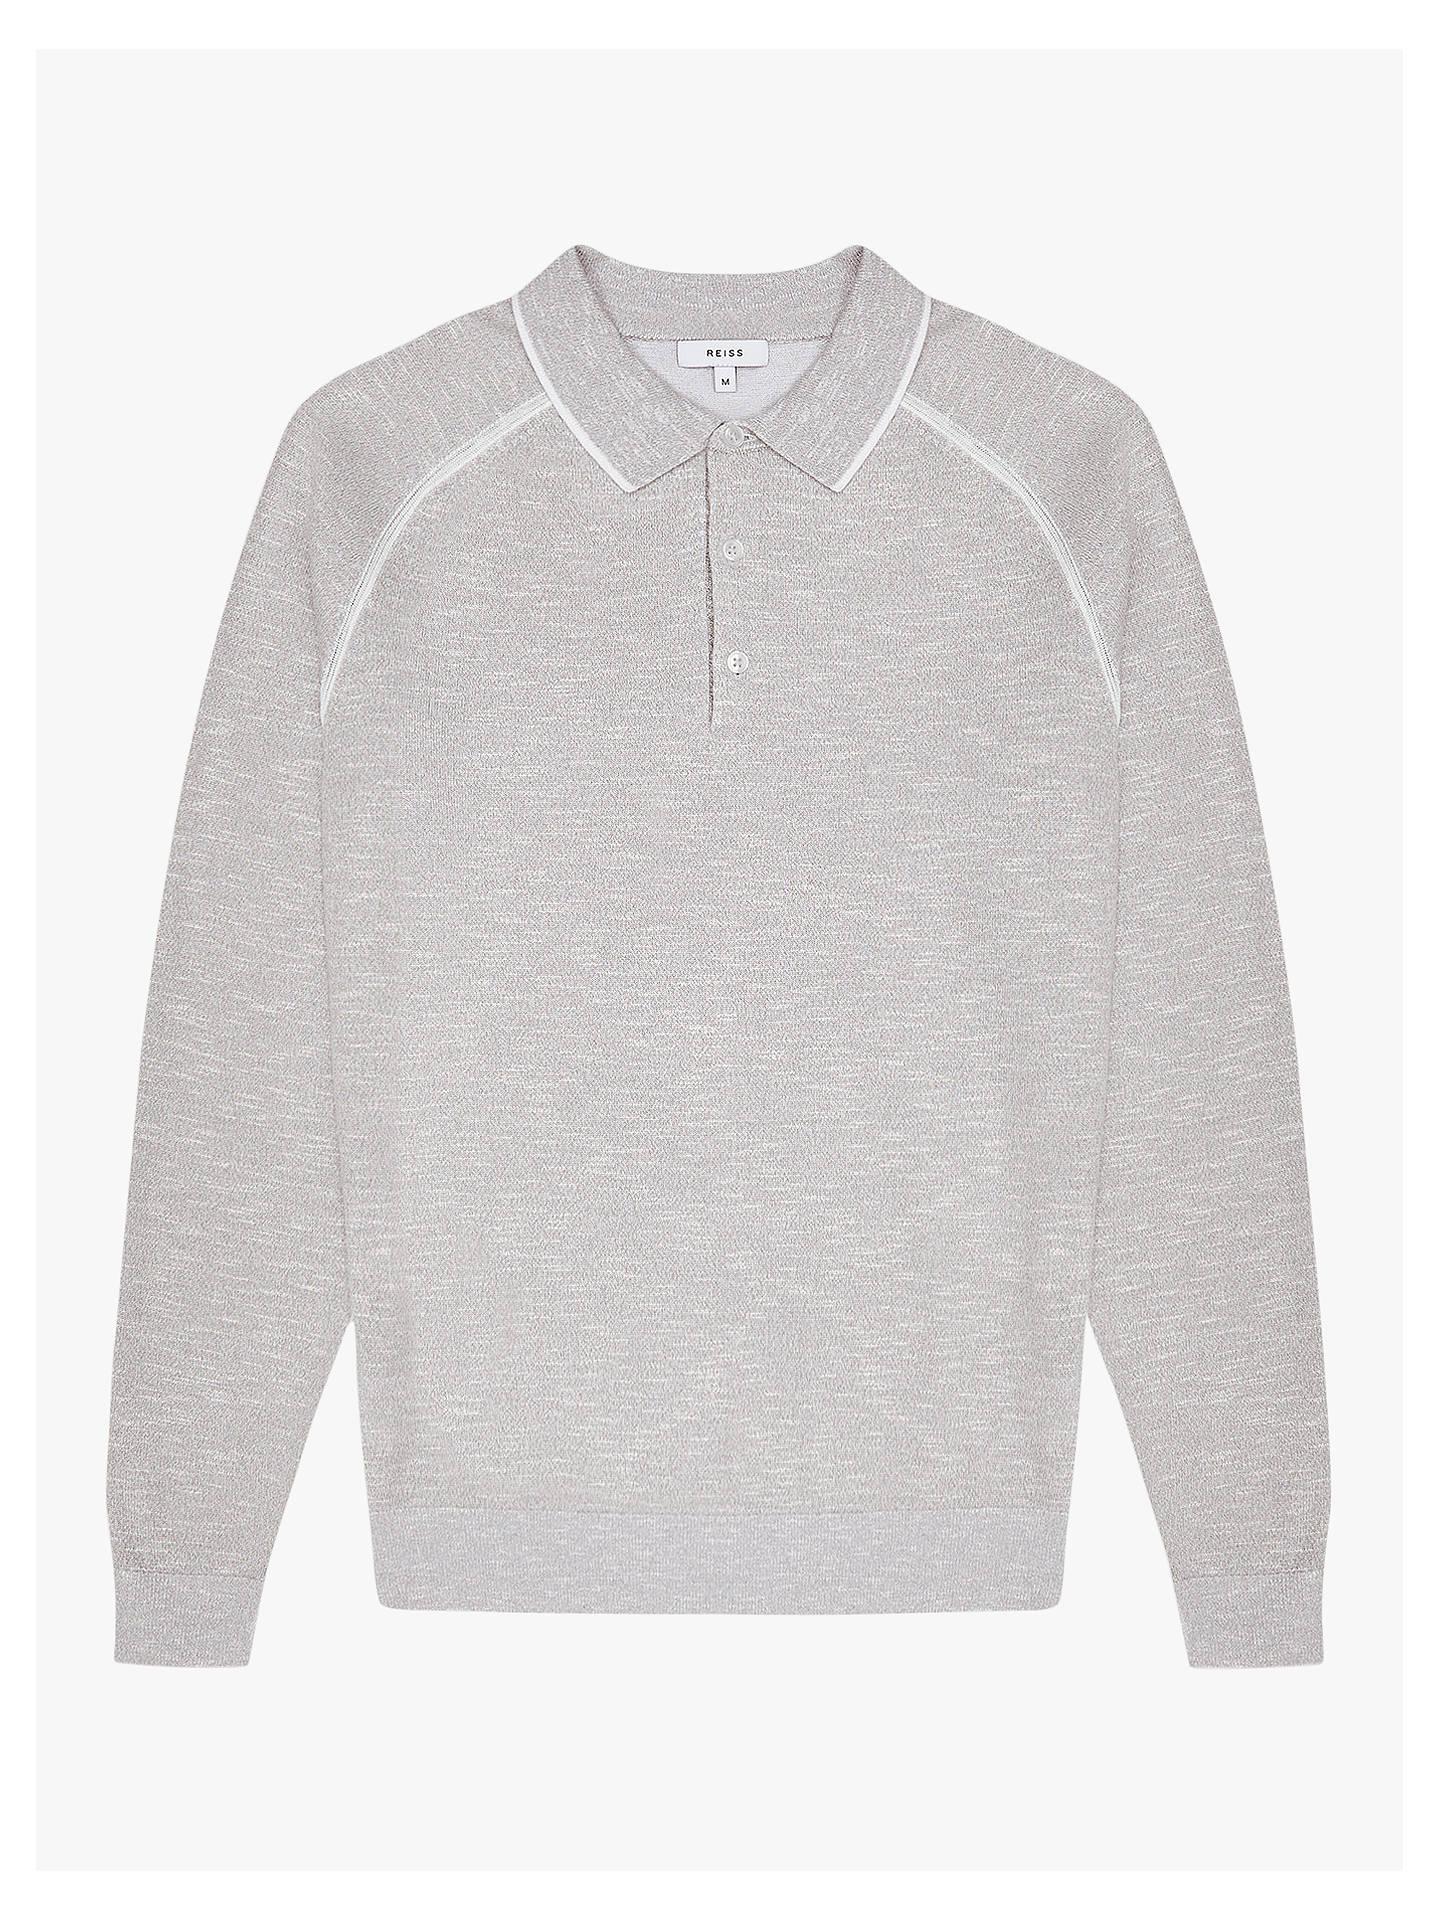 54e5495cf Reiss Earlsfield Long Sleeve Tipped Polo Shirt, Grey at John Lewis ...